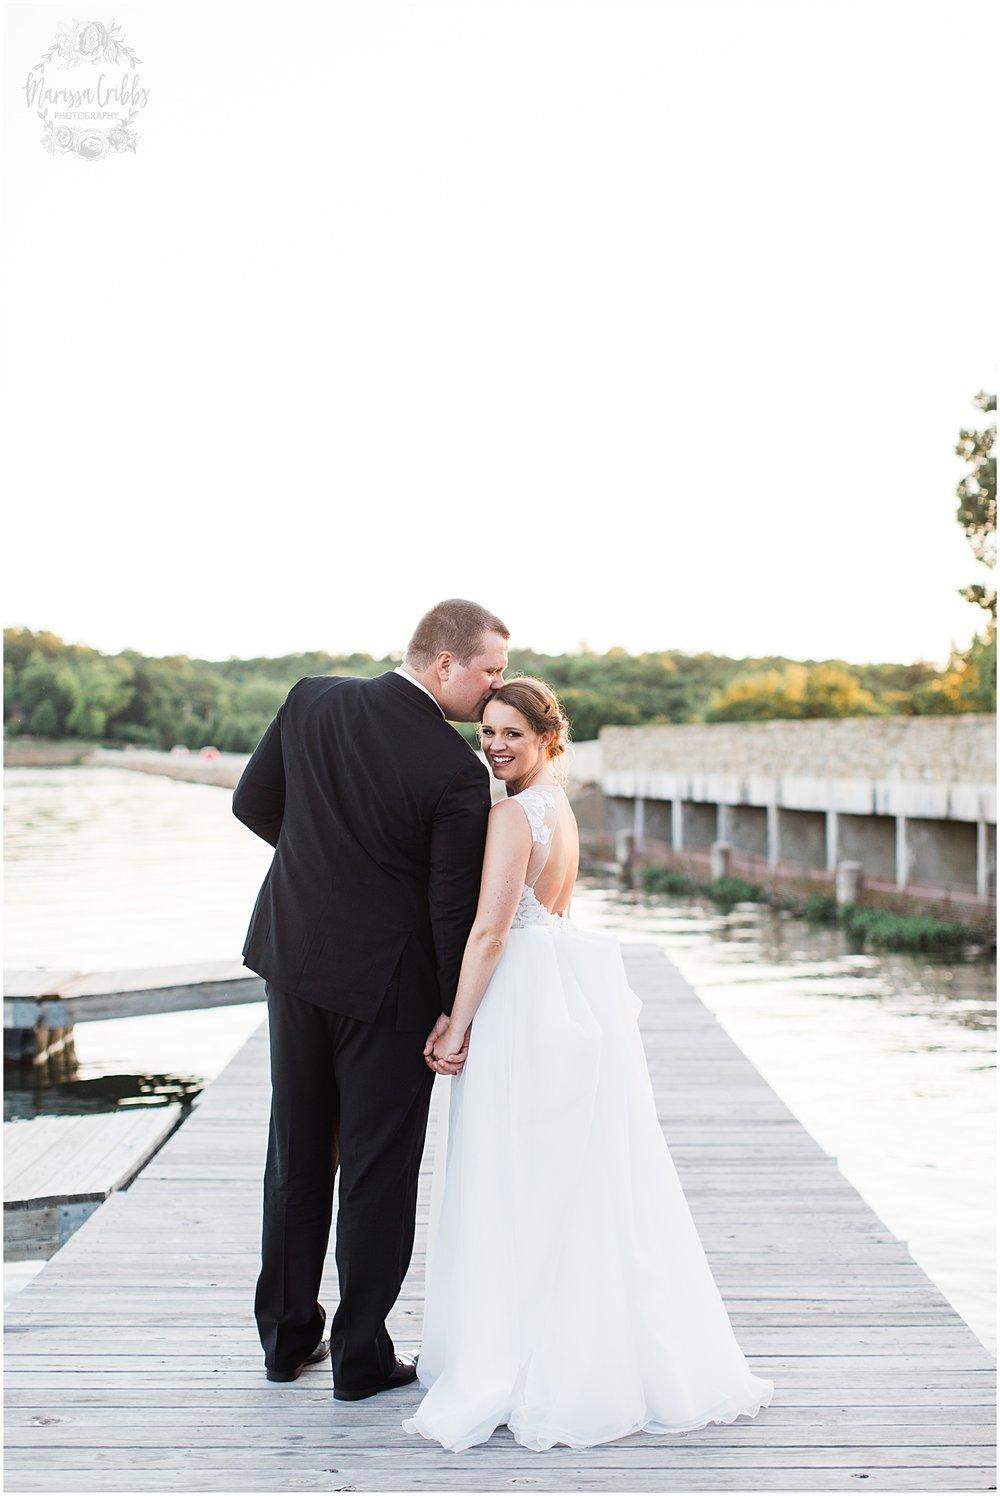 LAKE QUIVIRA COUNTRY CLUB WEDDING | MORGAN & RYAN | MARISSA CRIBBS PHOTOGRAPHY_5538.jpg